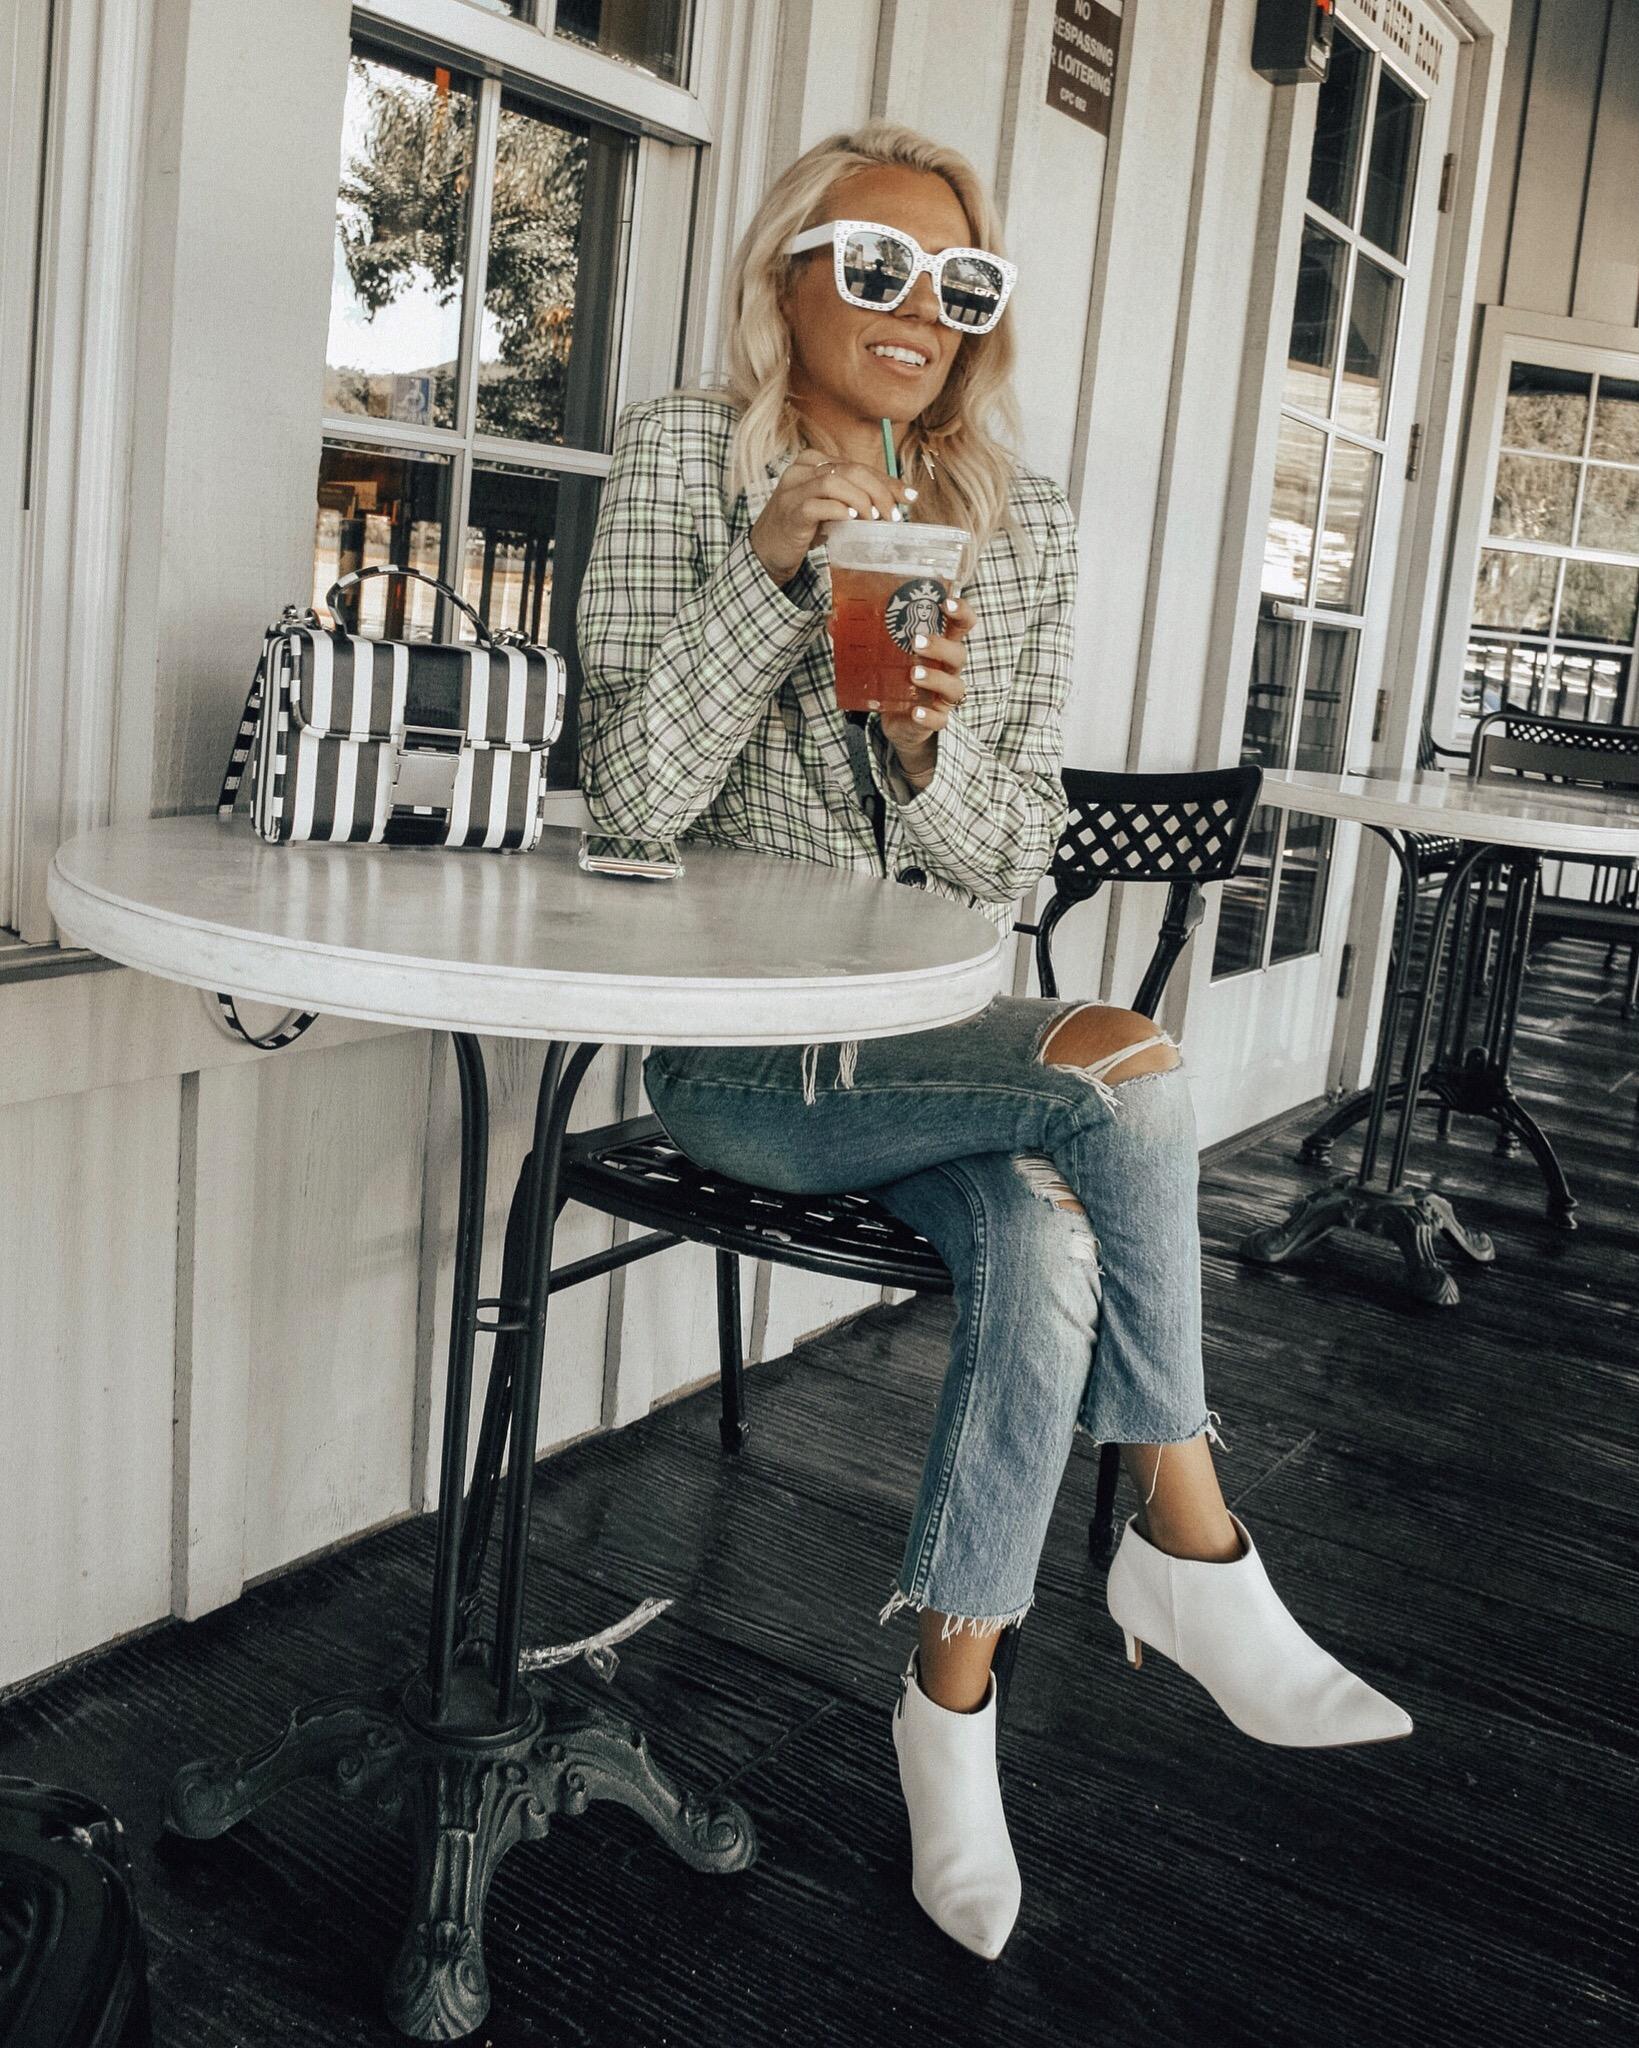 MAD FOR PLAID- Jaclyn De Leon Style + fall fashion + plaid blazer + street style + style inspo + band tee + white boots + striped handbag + 90's fashion + retro style + starbucks + mom style